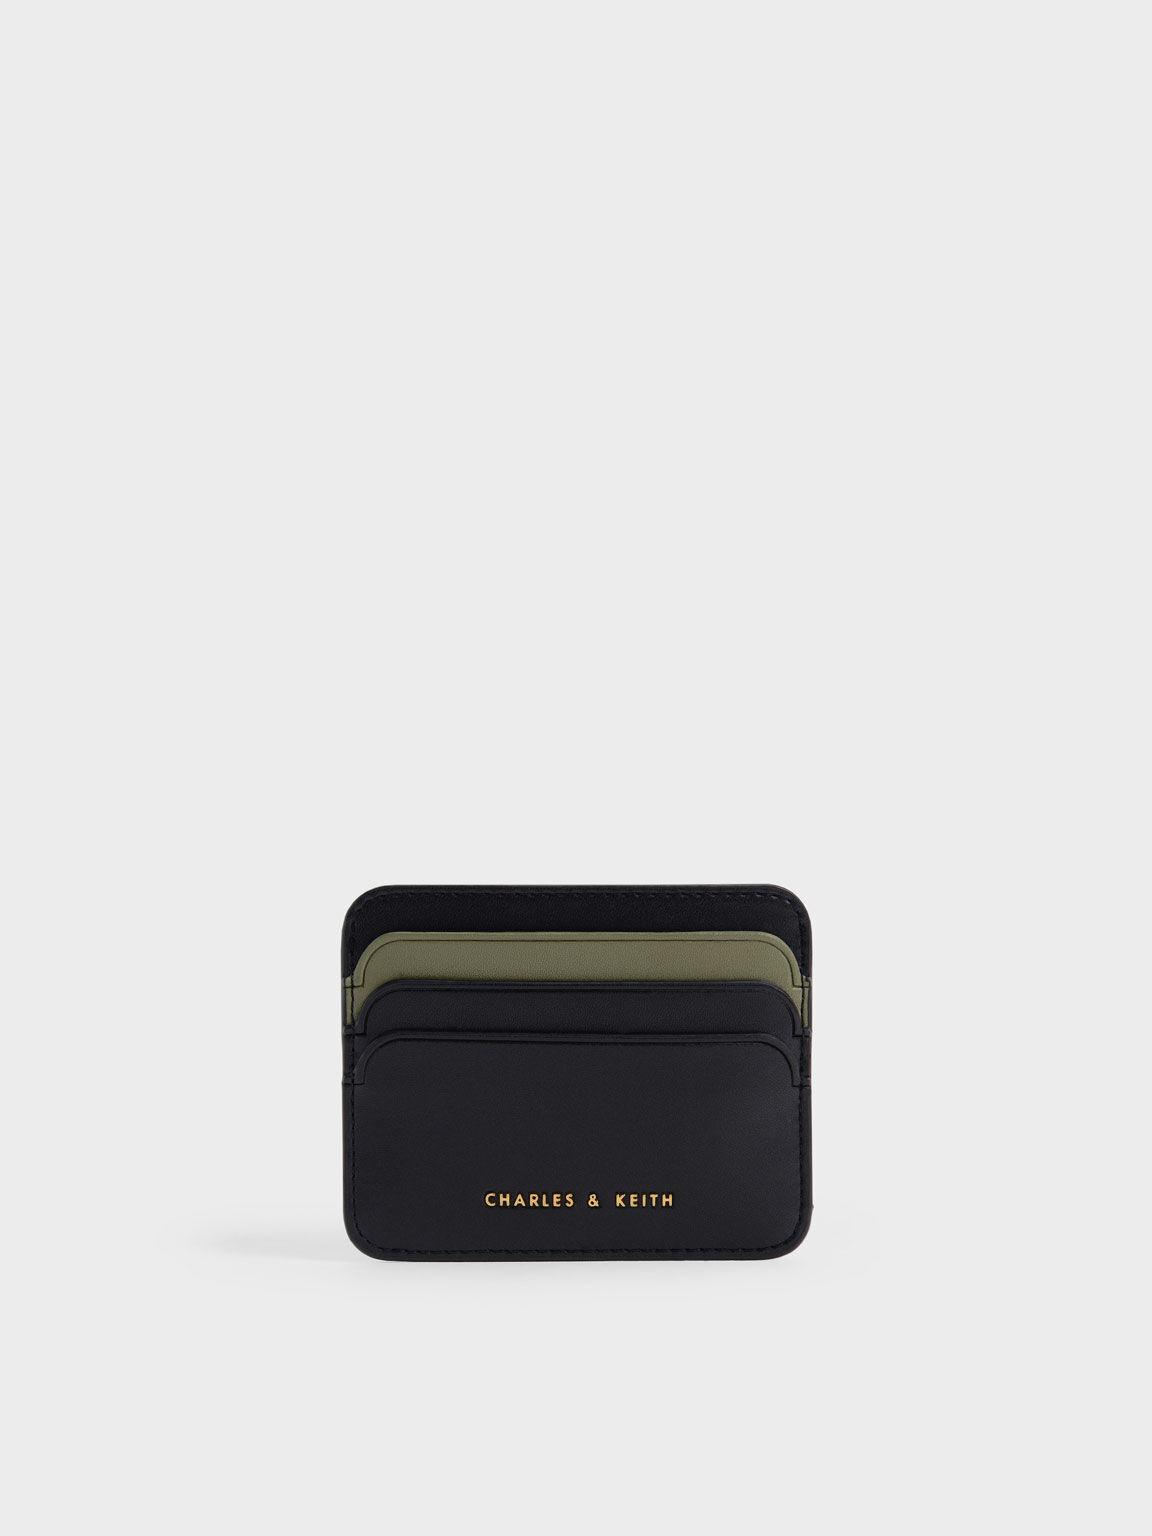 Two-Tone Multi Slot Card Holder, Black, hi-res